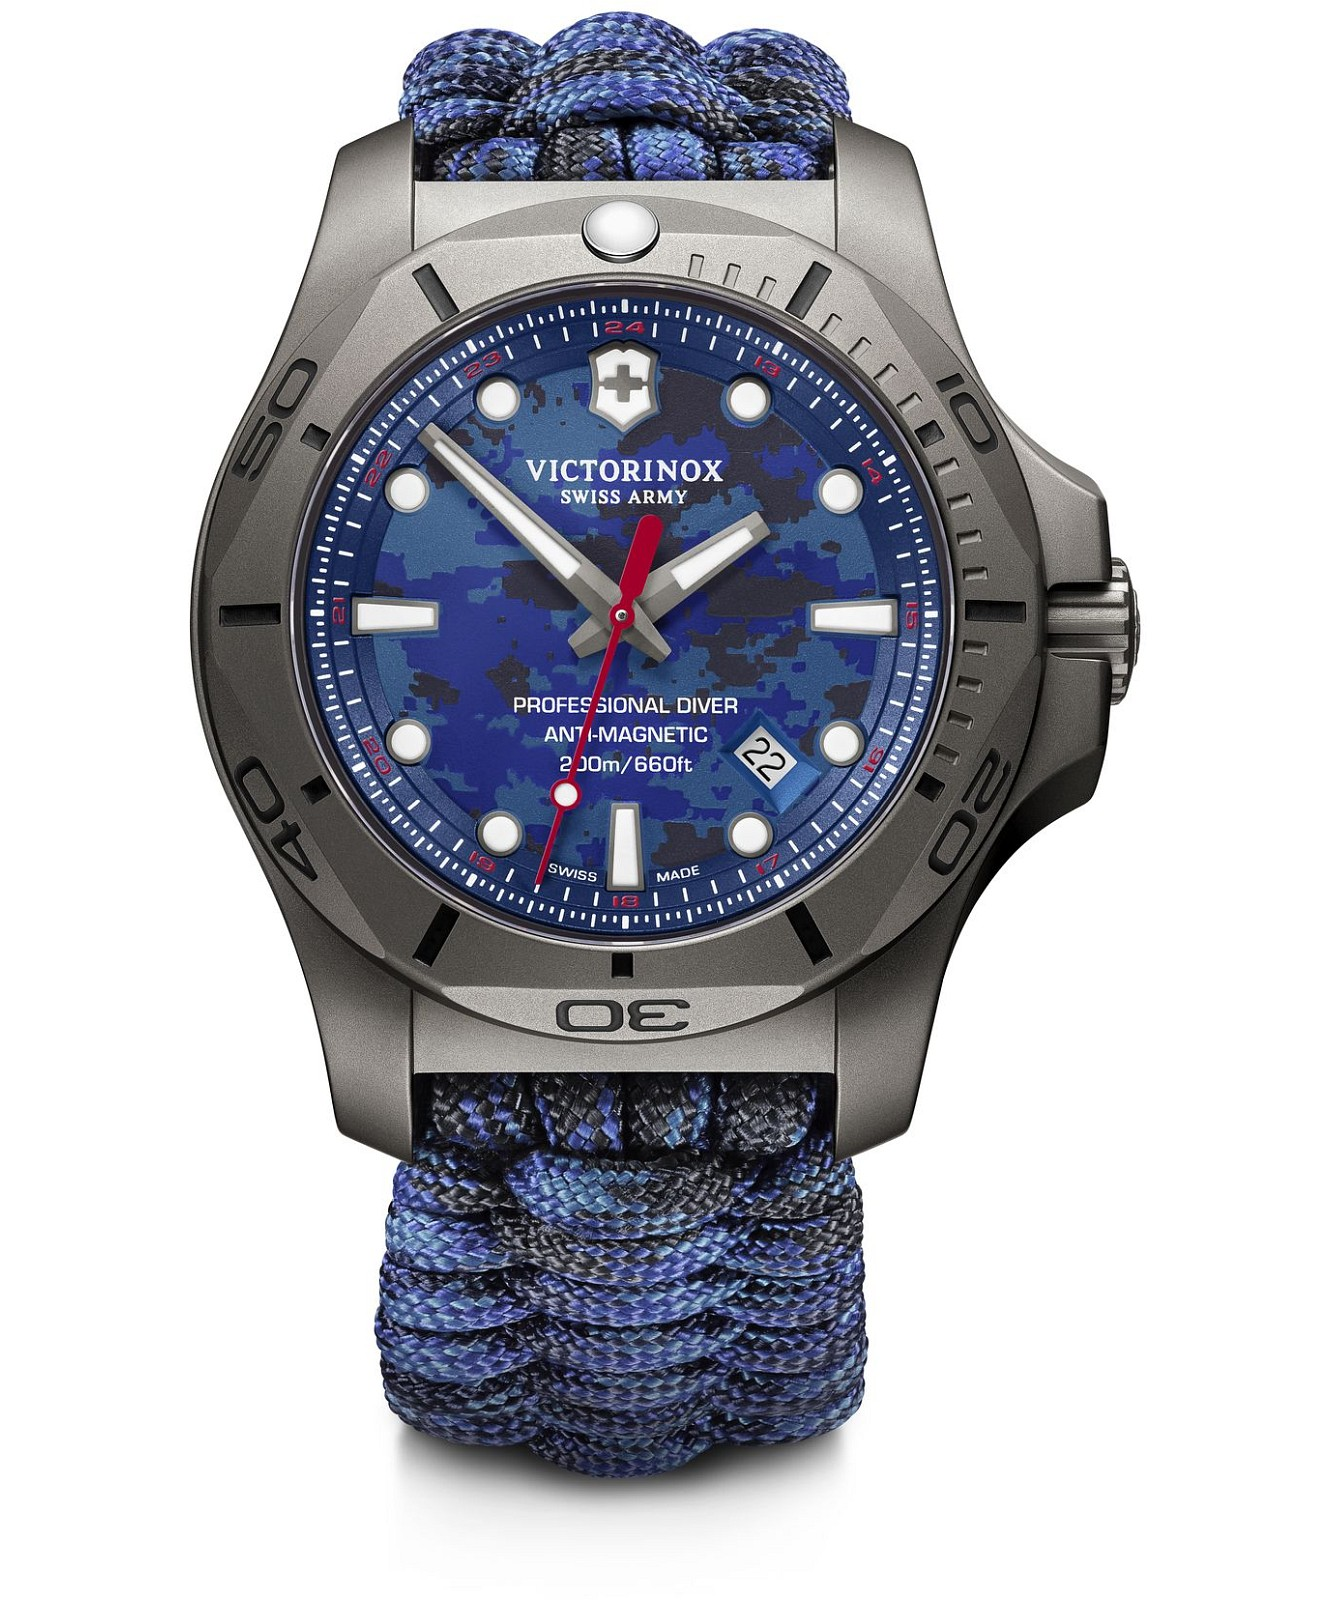 zegarek-meski-victorinox-i-n-o-x-professional-diver-241813_001